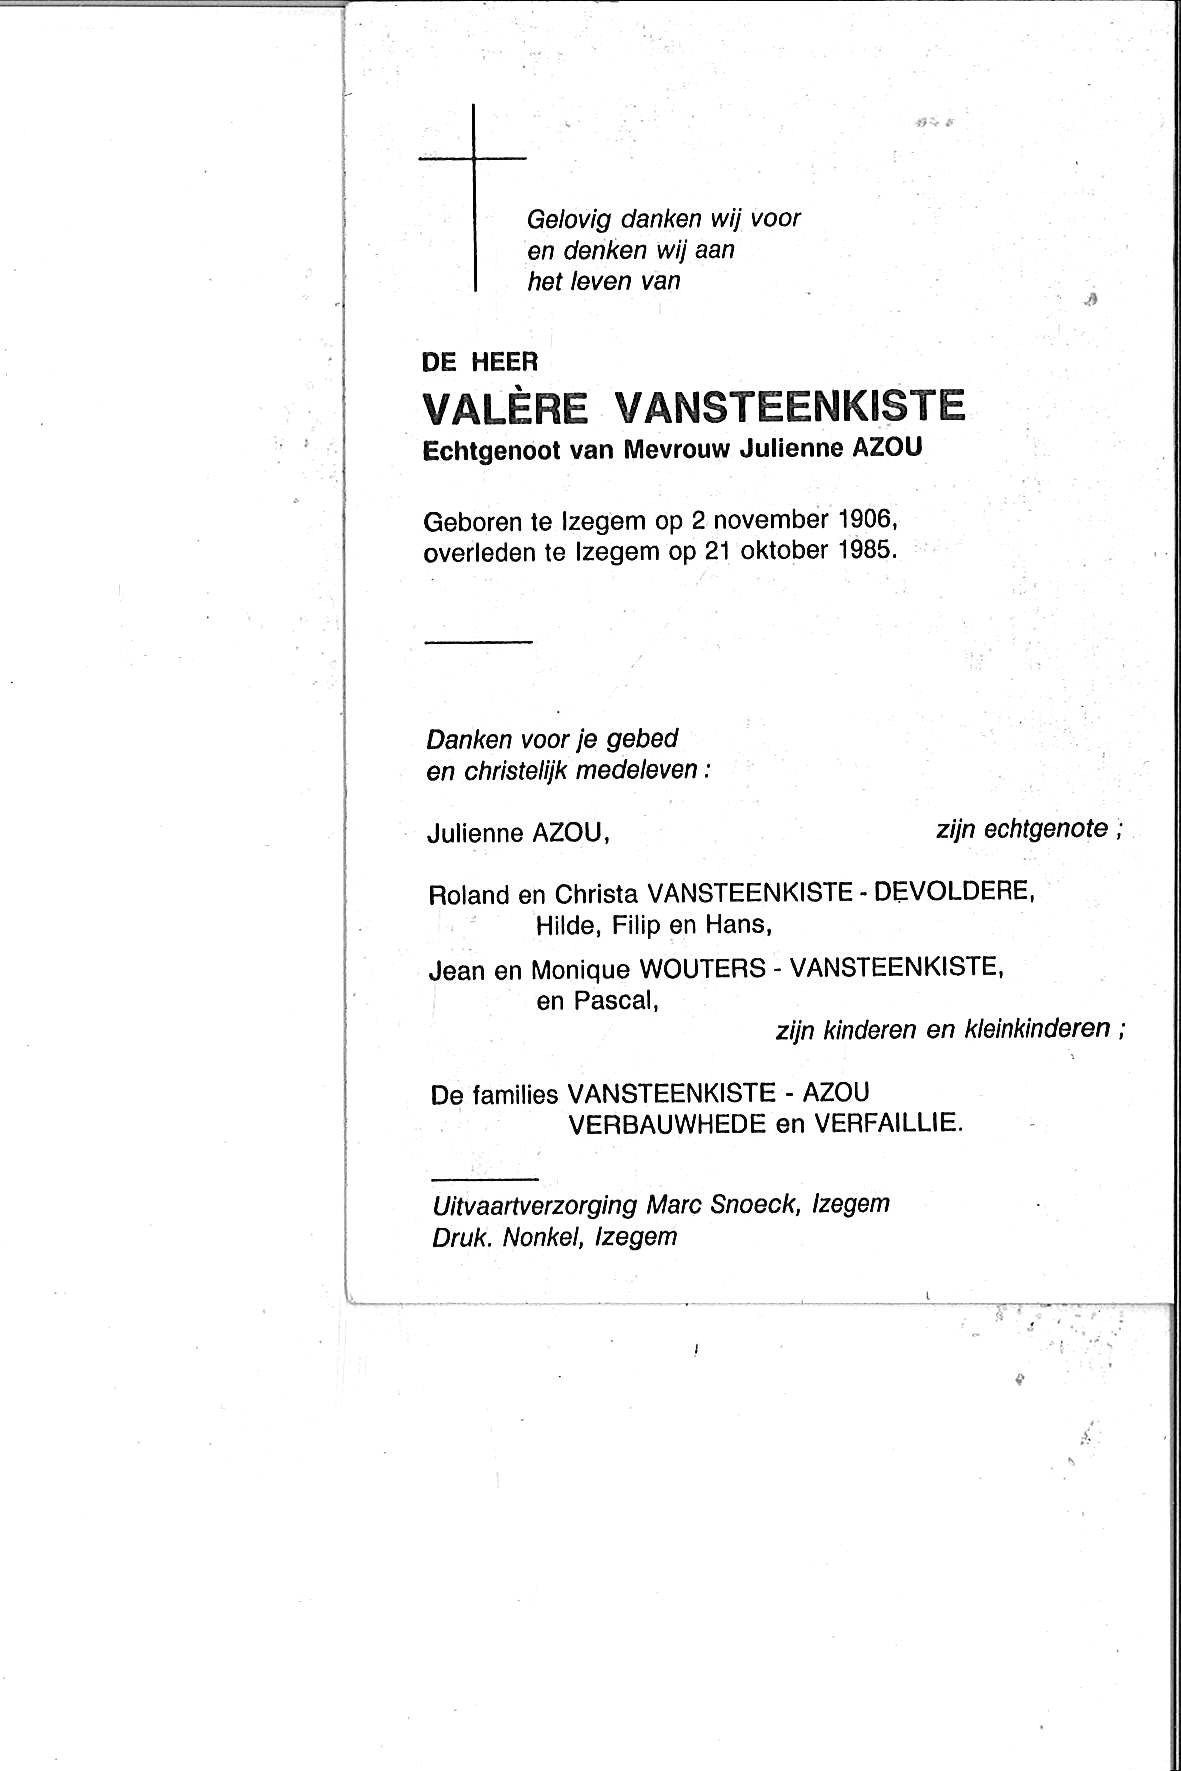 Valére(1985)20150708085204_00018.jpg